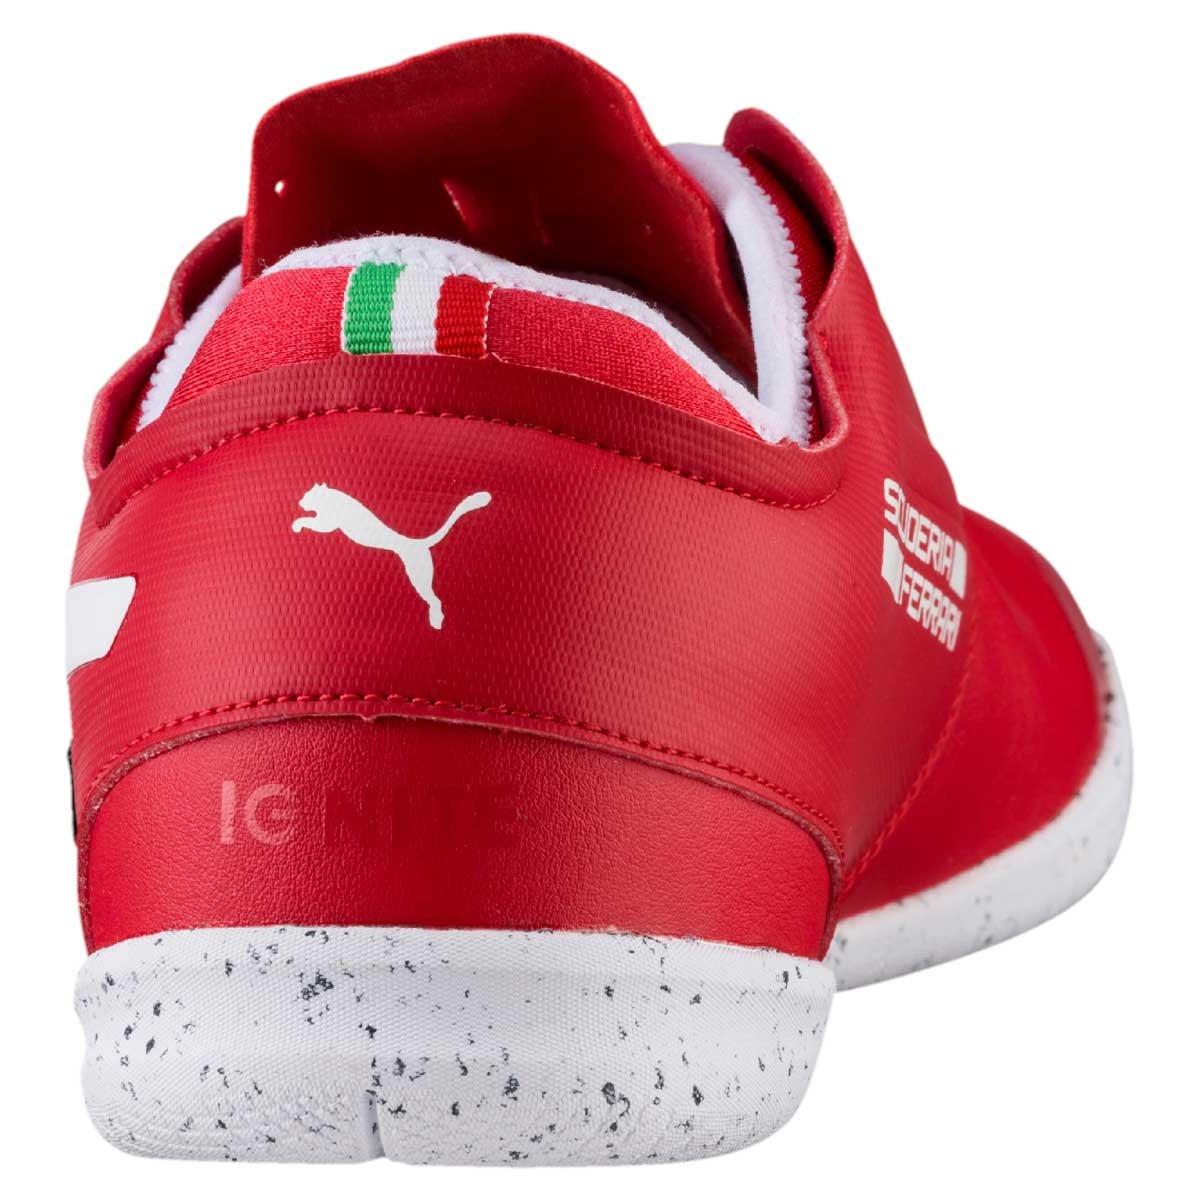 4dc1194ca80 Tenis Ferrari.Comprar Tenis Ferrari Puma Baratas. Oferta Tenis Puma ...